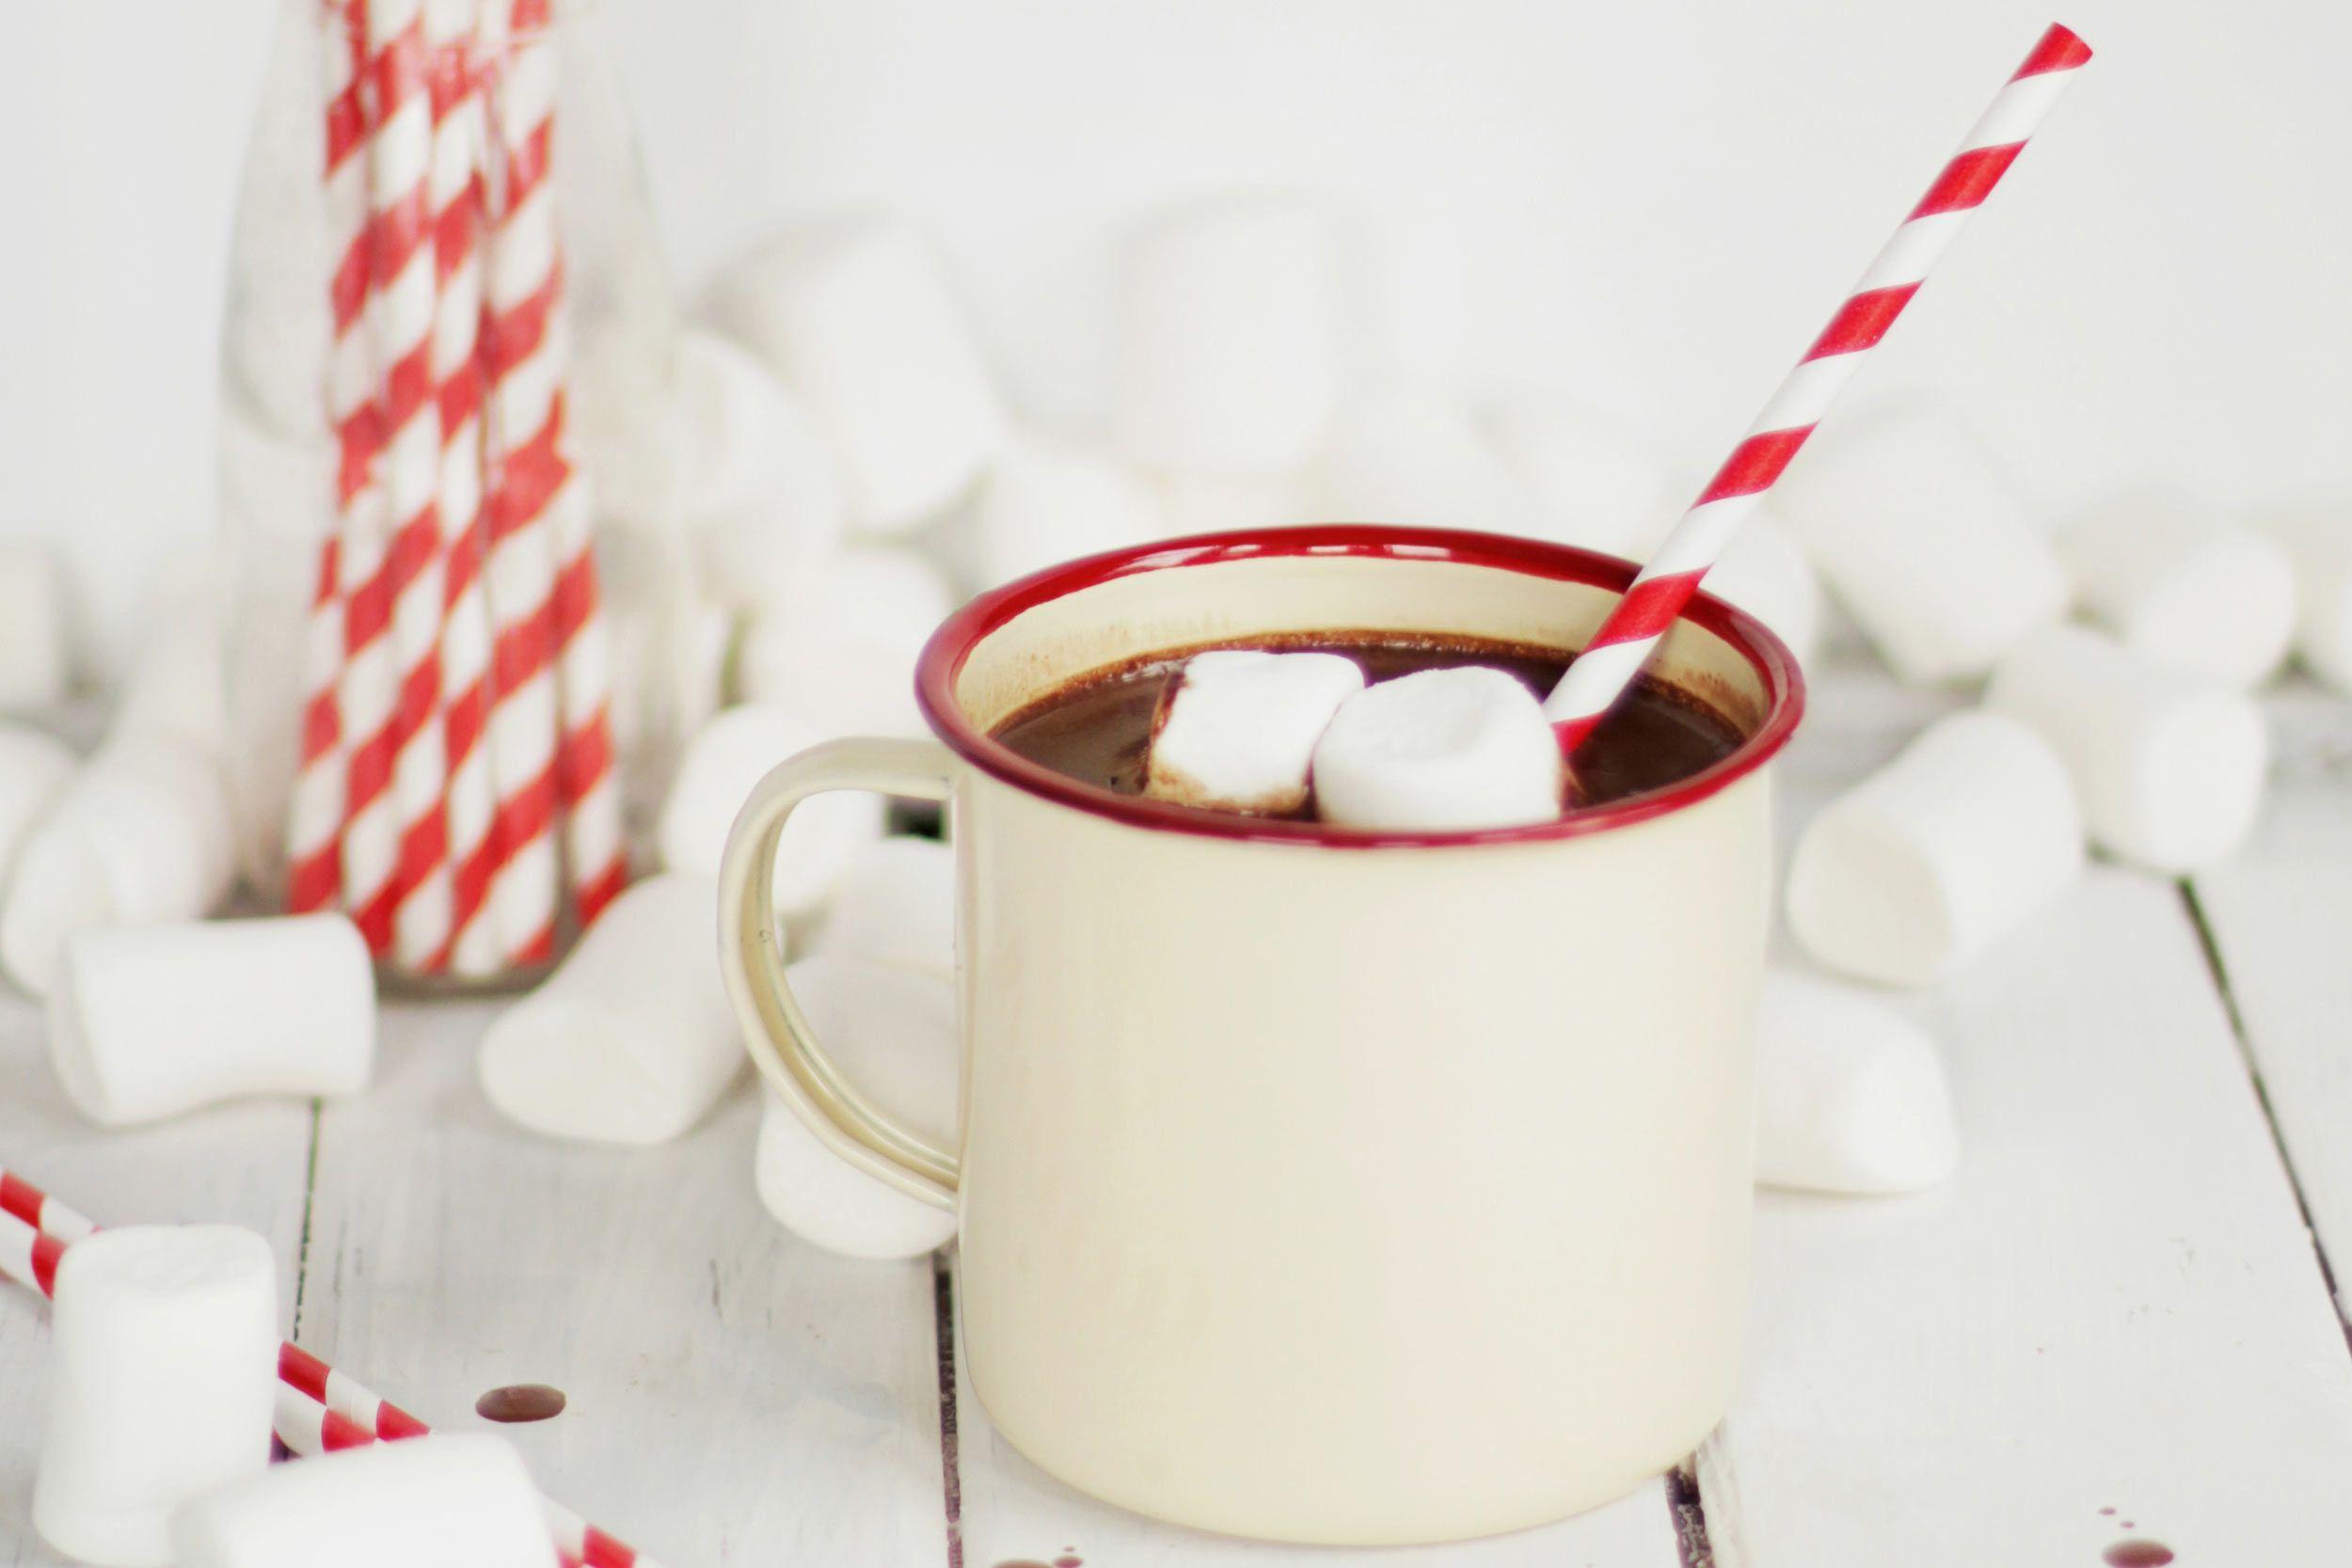 Hot Cocoa Recipe With Marshmallows